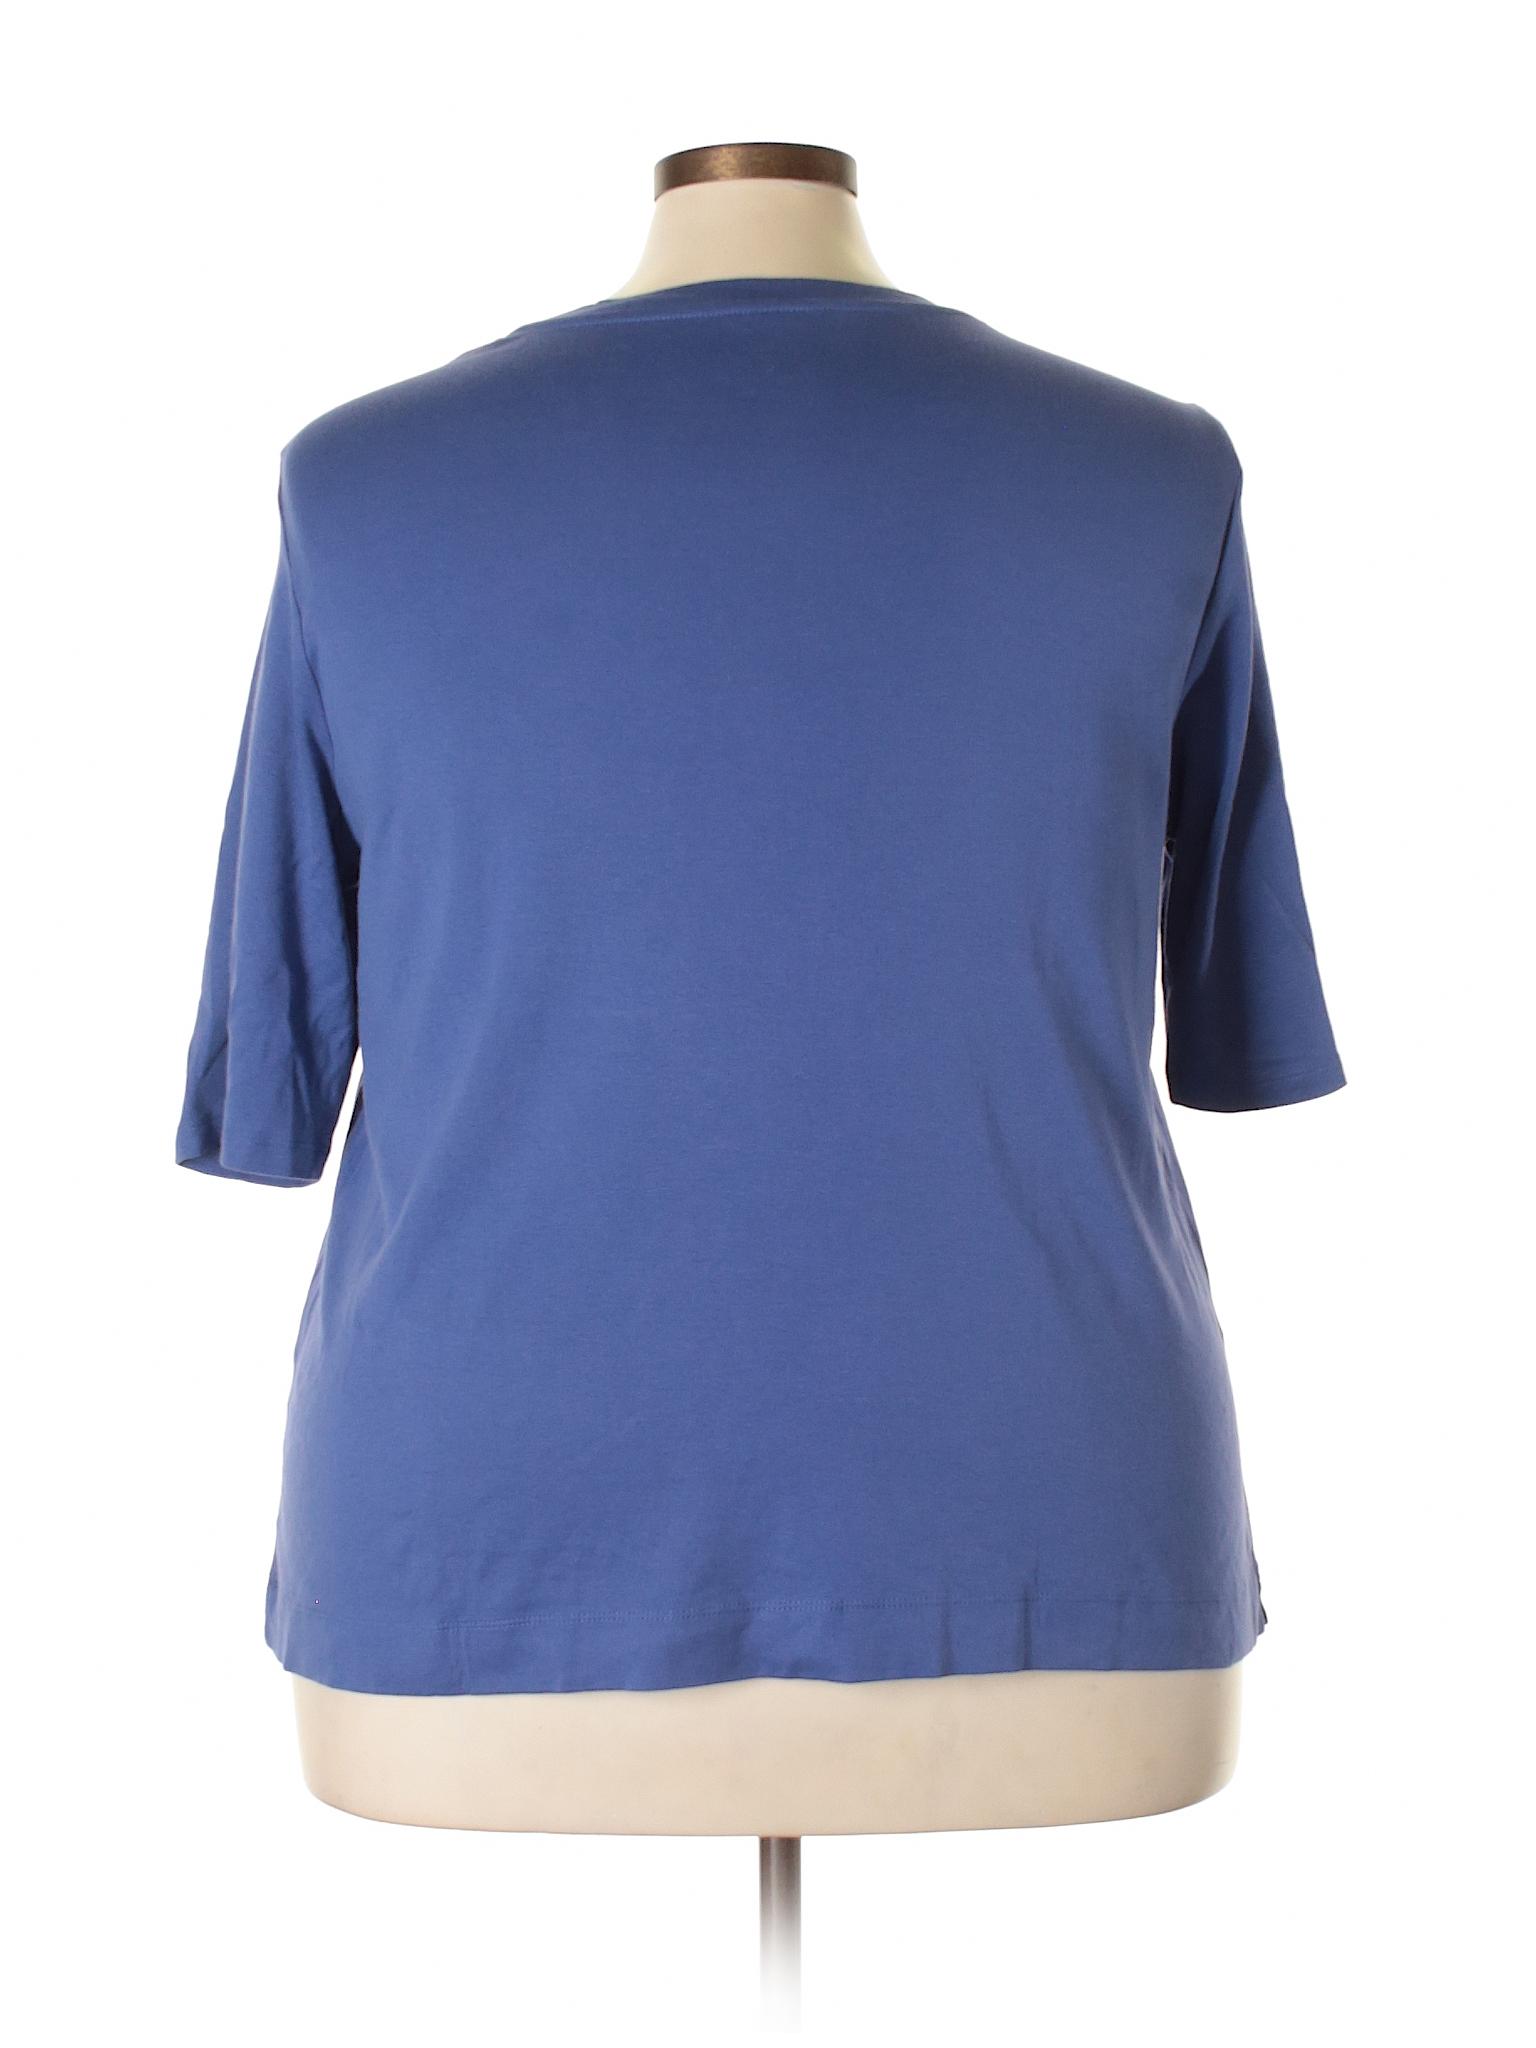 5514acb9d52 J.jill 100% Pima Cotton Solid Dark Blue Short Sleeve T-Shirt Size 1X (Plus)  - 81% off